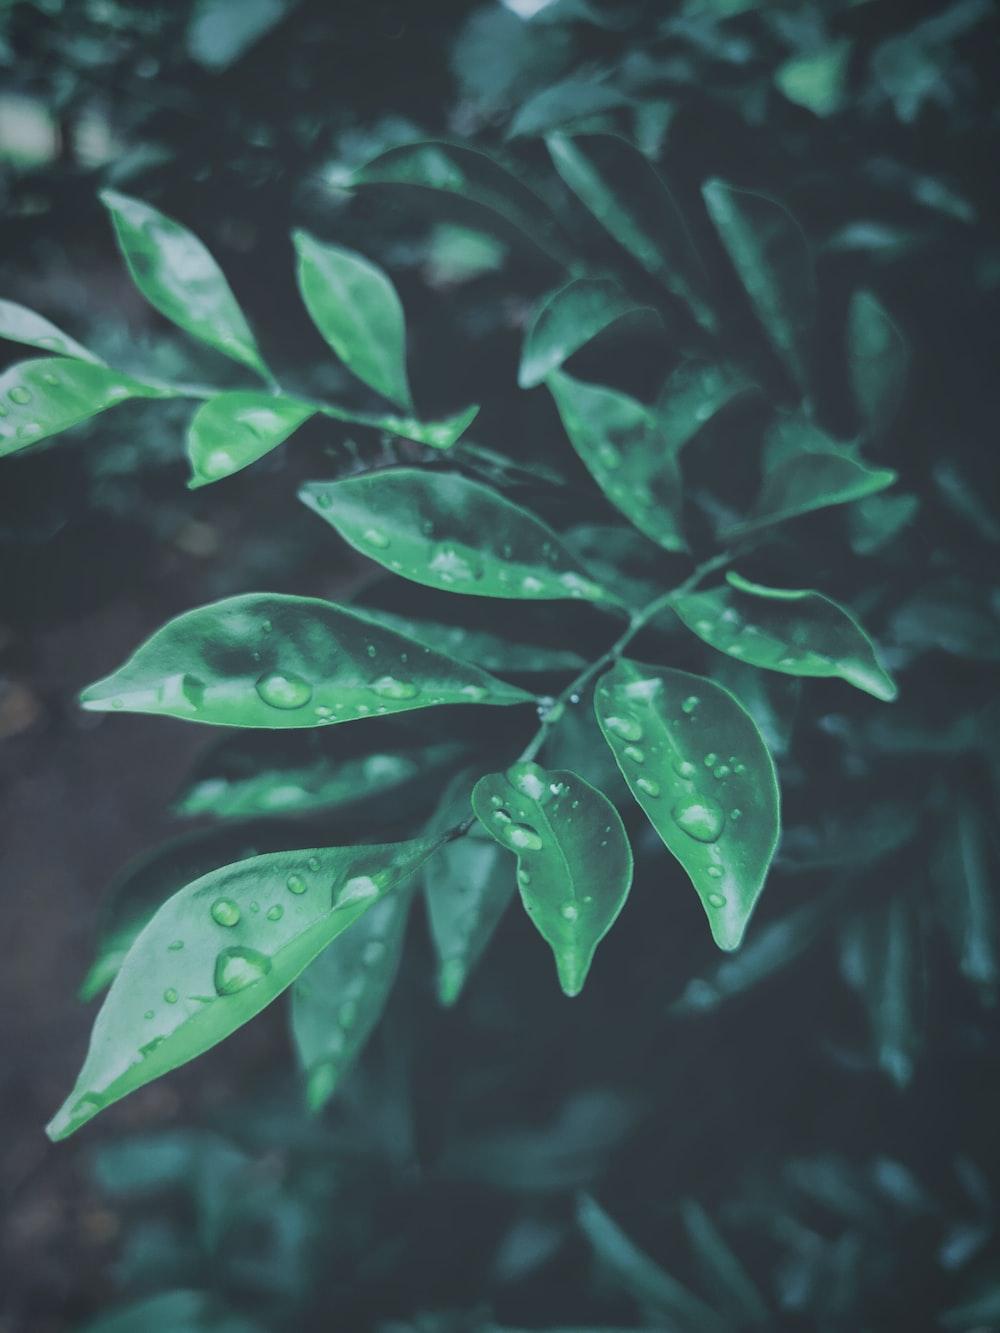 dew drops on green tree leaves